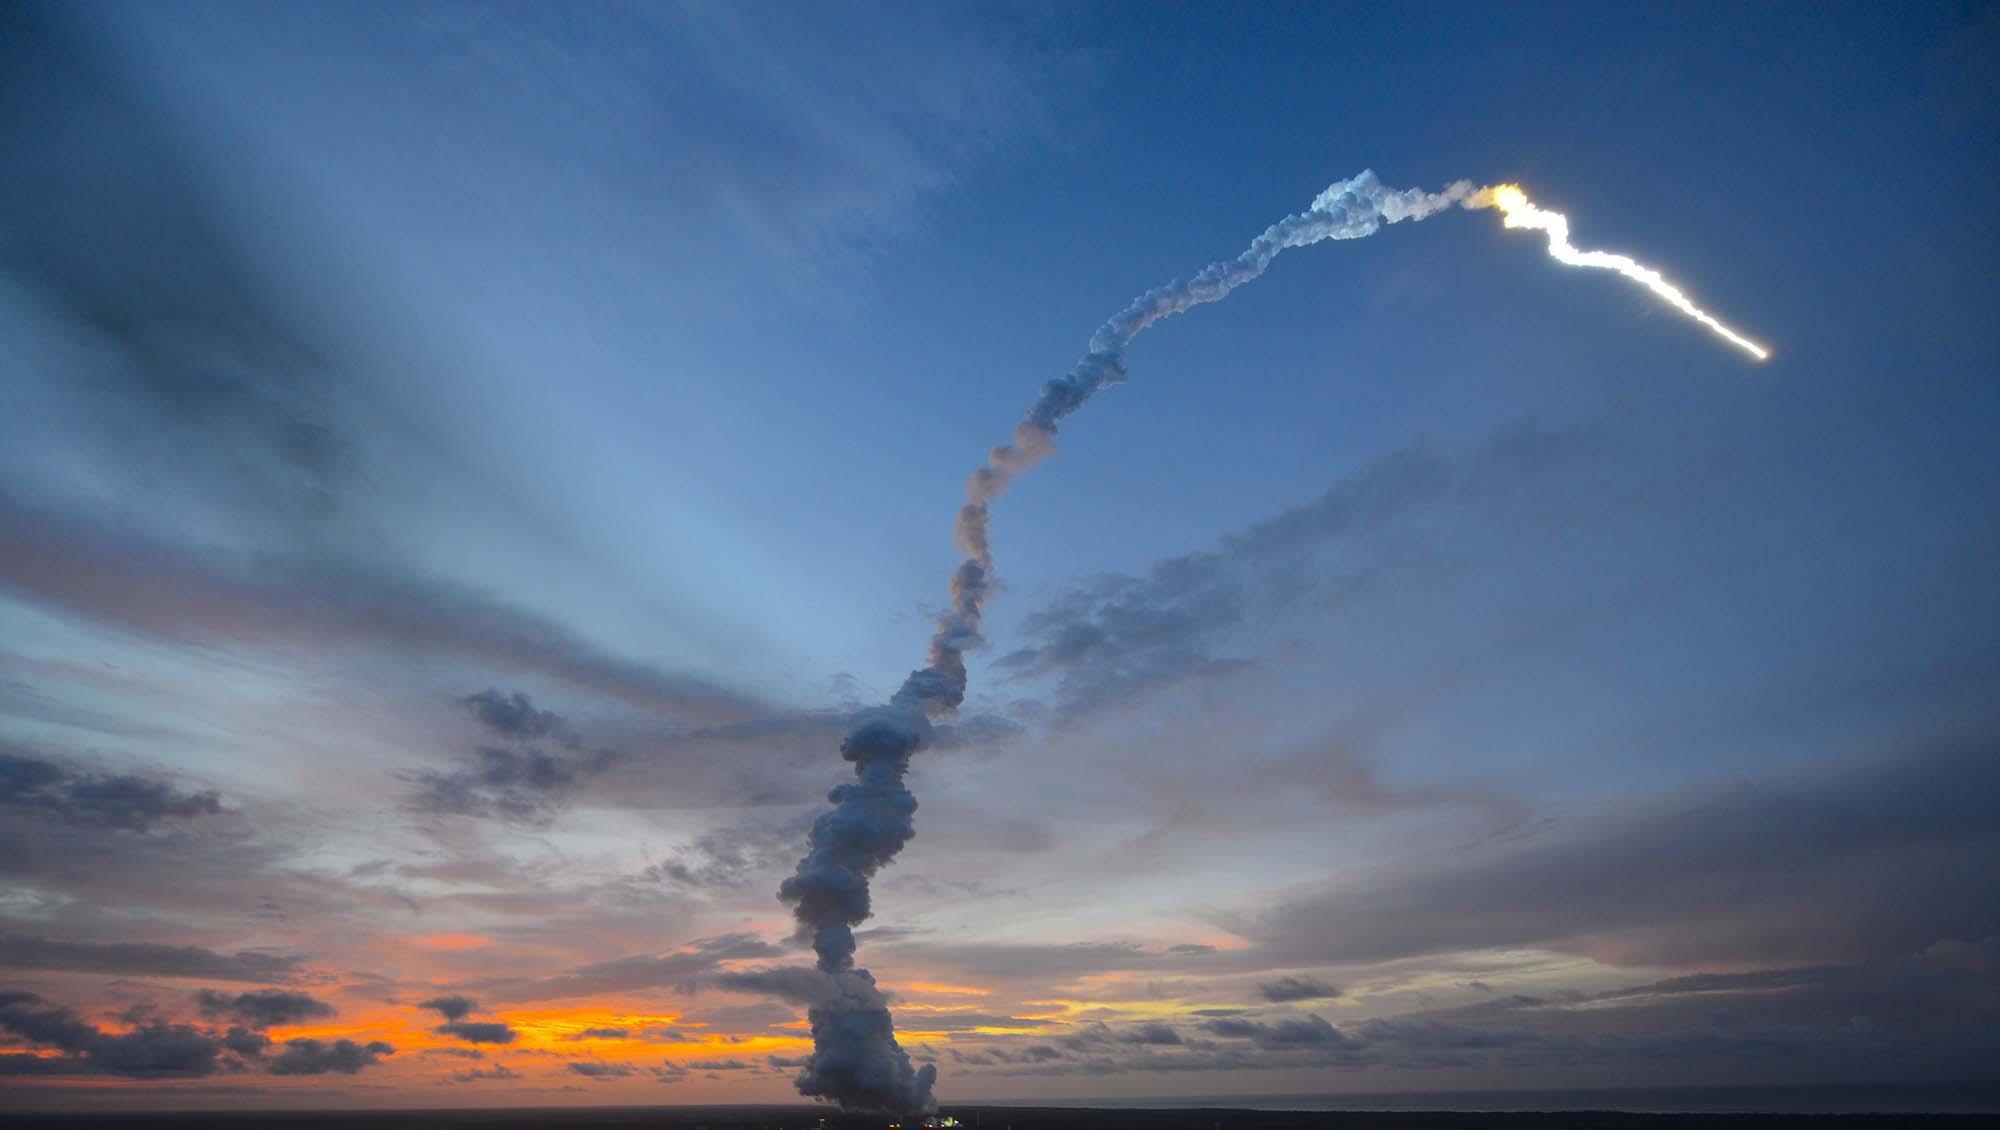 Calendrier Lancement Ariane 2019.Satellites Arianespace Retrouve Son Planning De Lancement